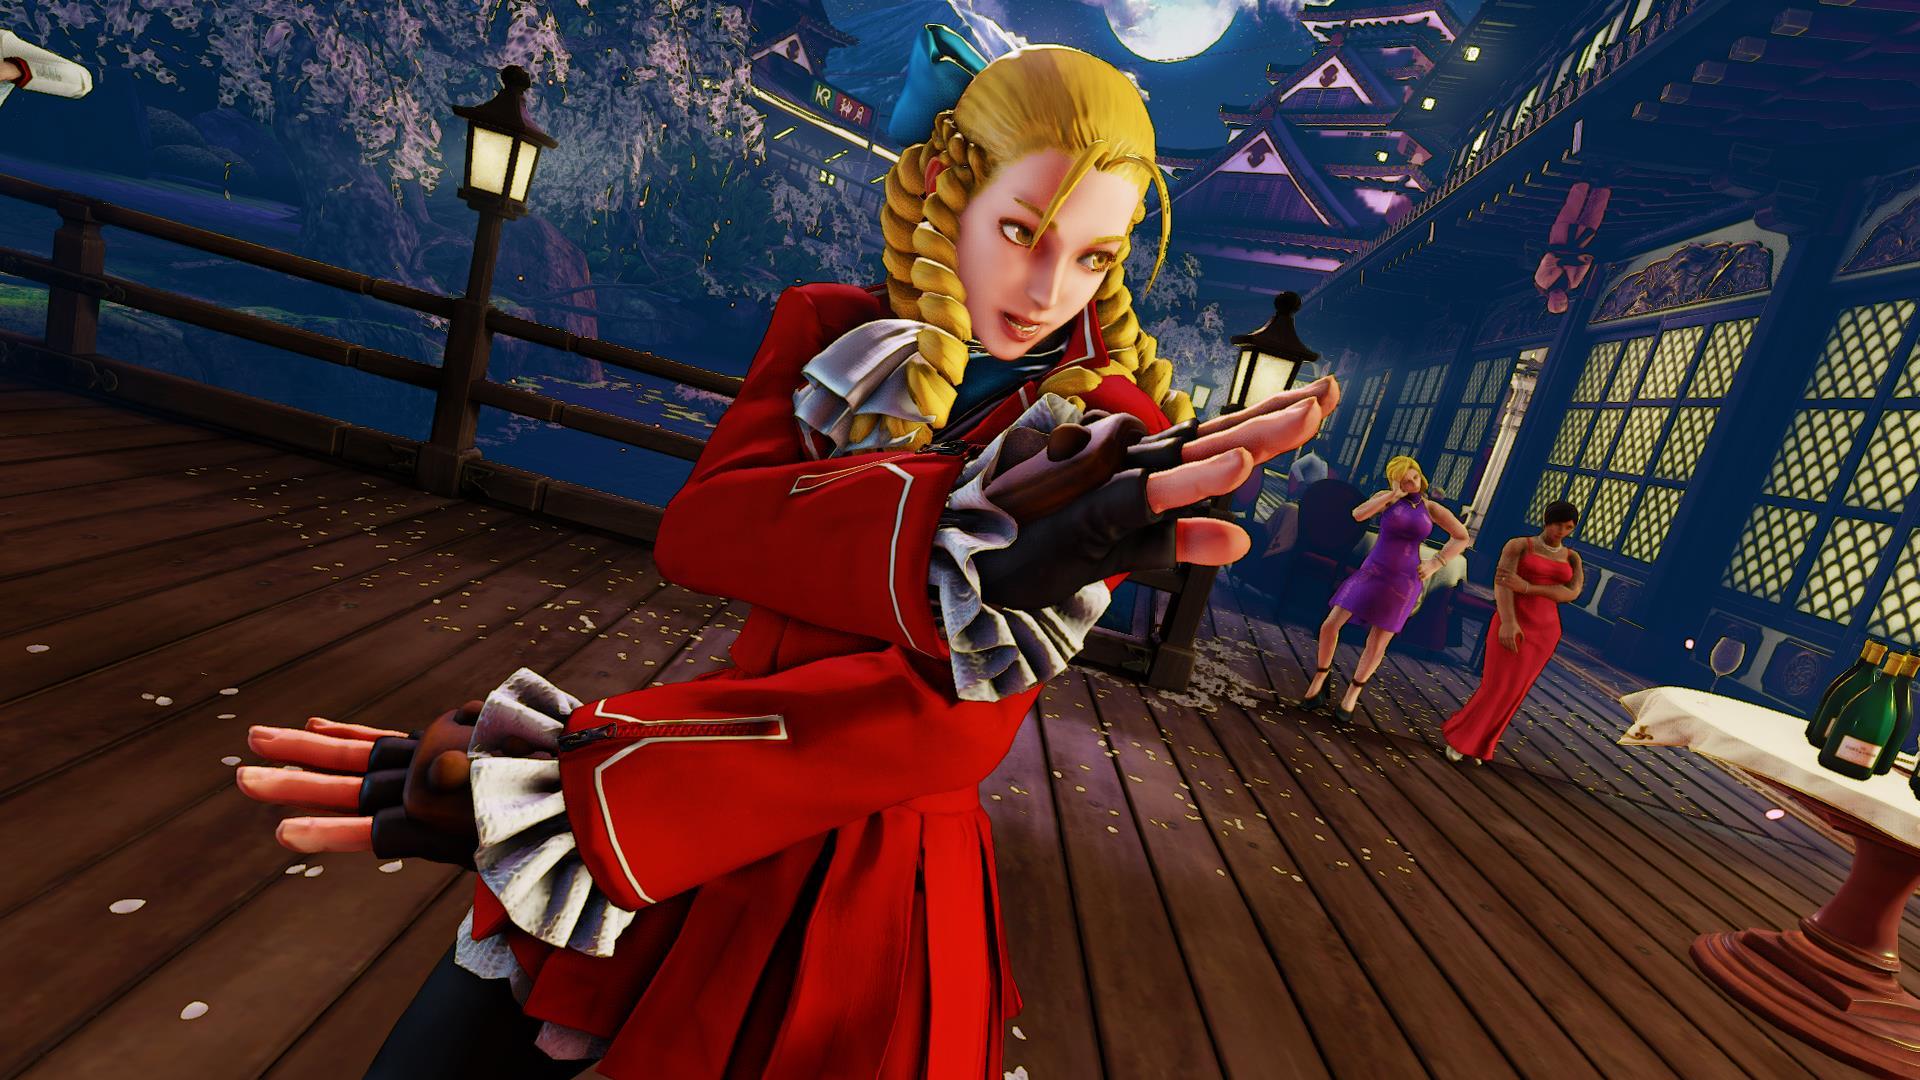 Street Fighter 5: Alex is first DLC, PS3 controller